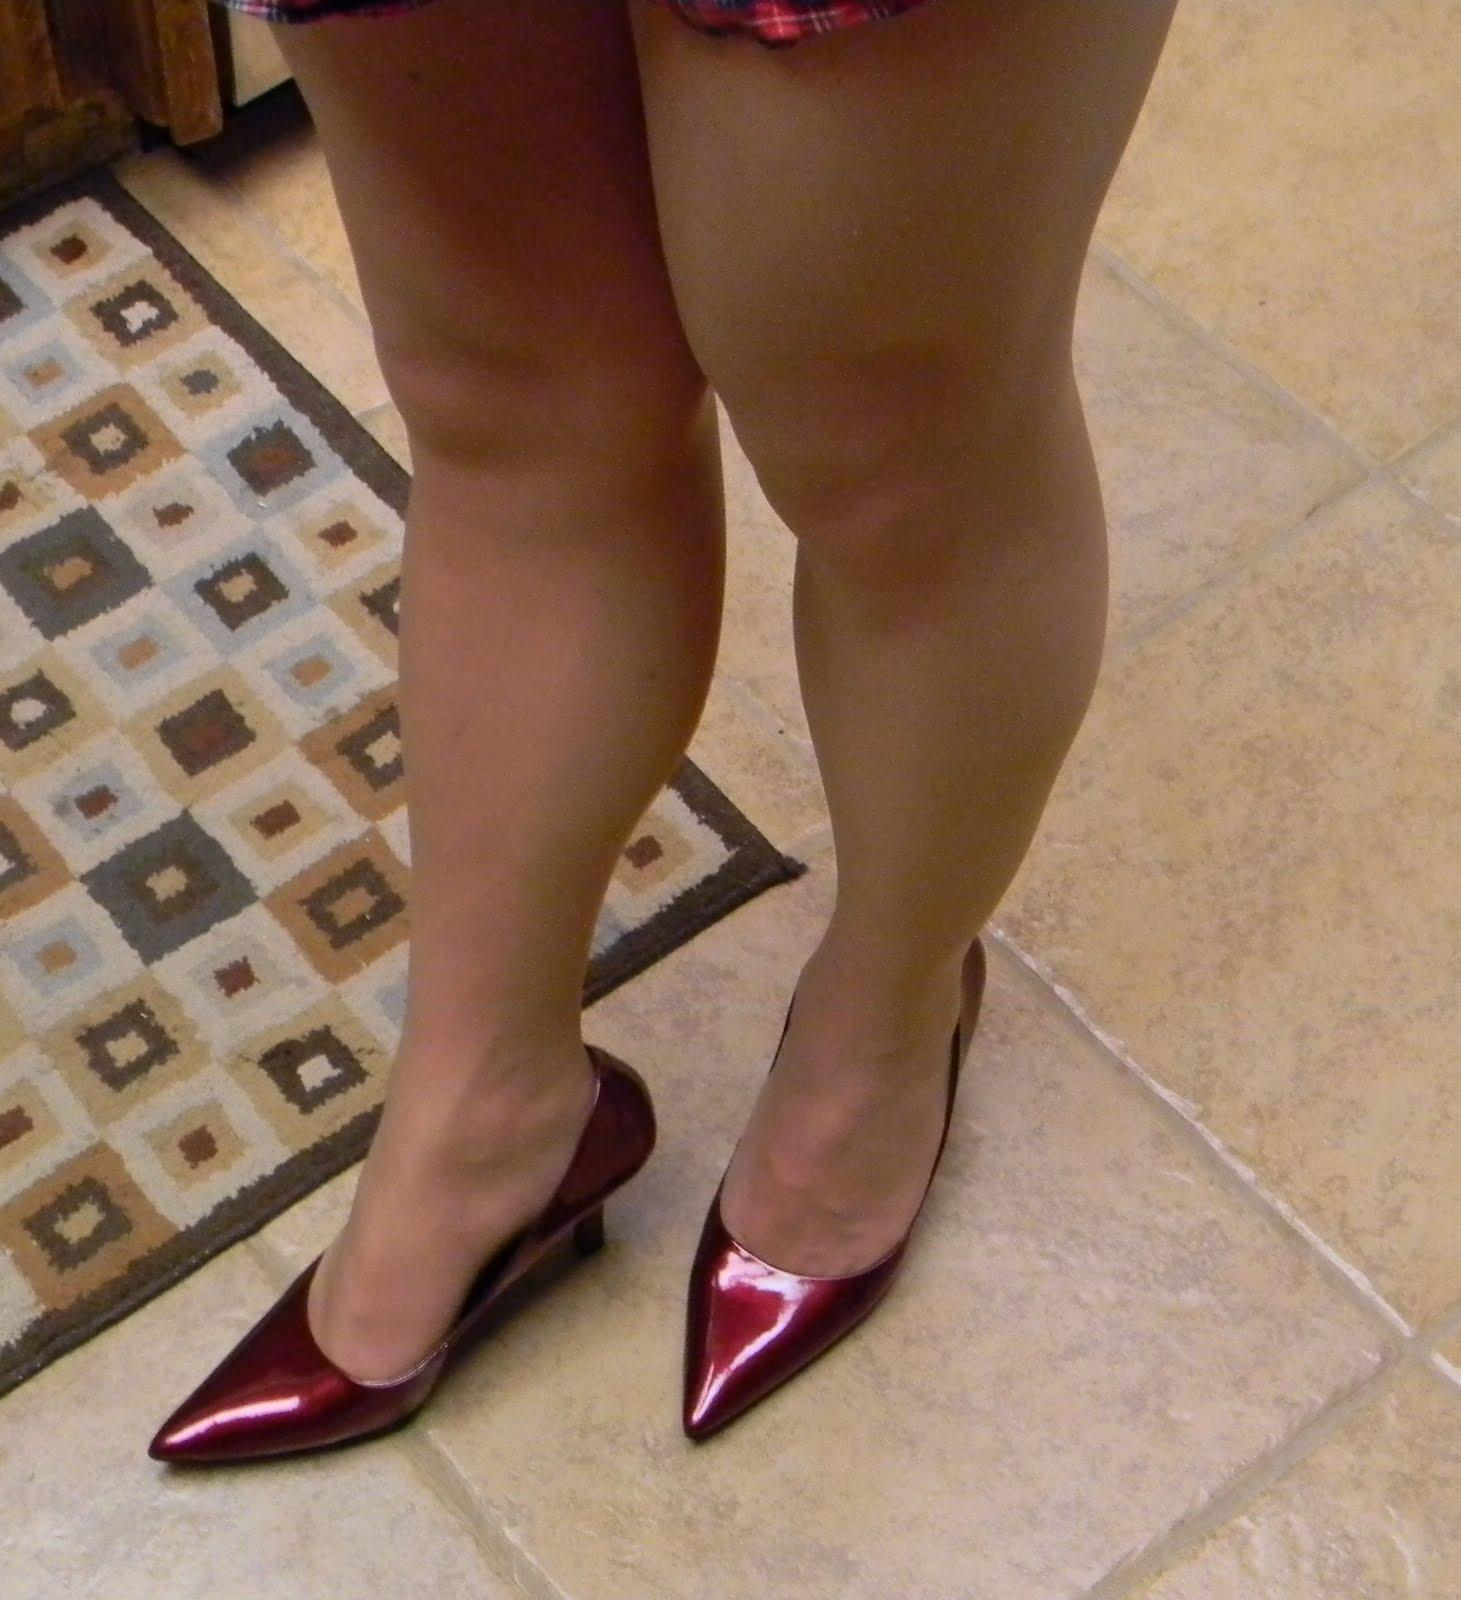 Transvestites shave legs